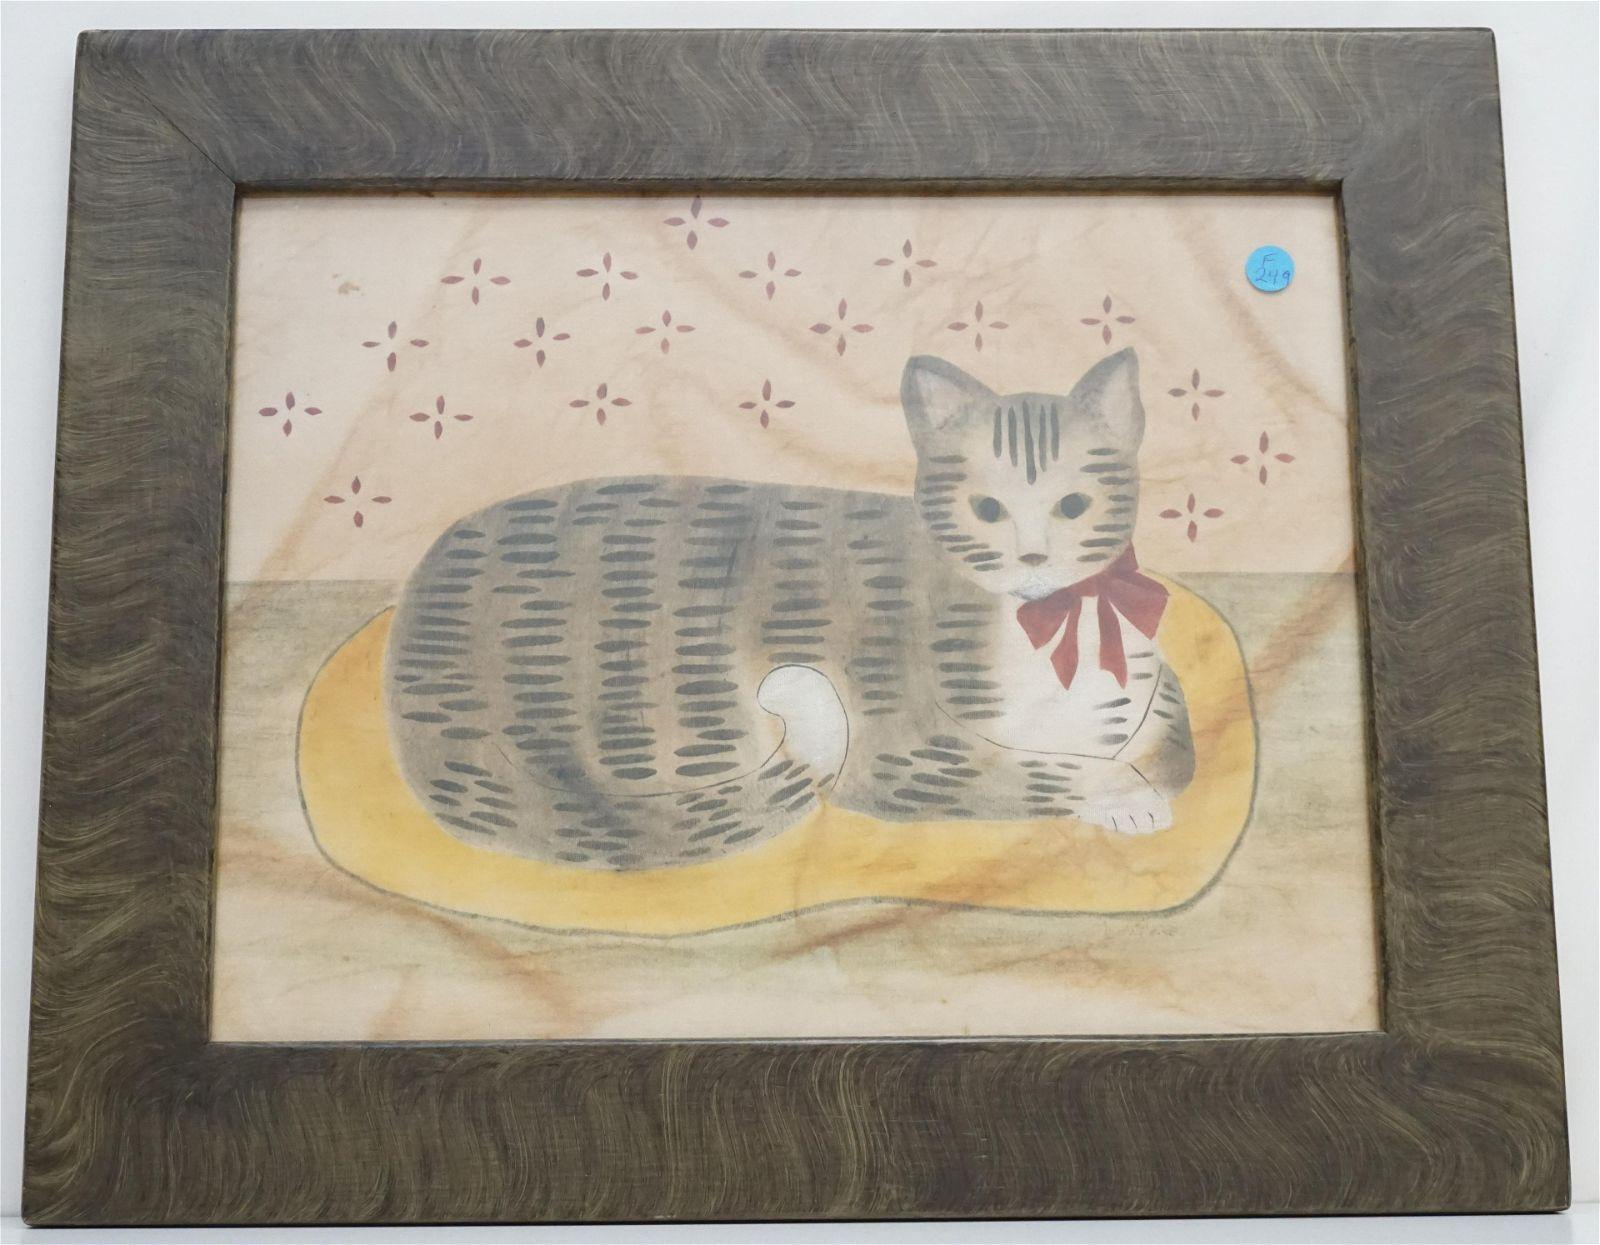 AMERICAN FOLK ART CAT THEOREM